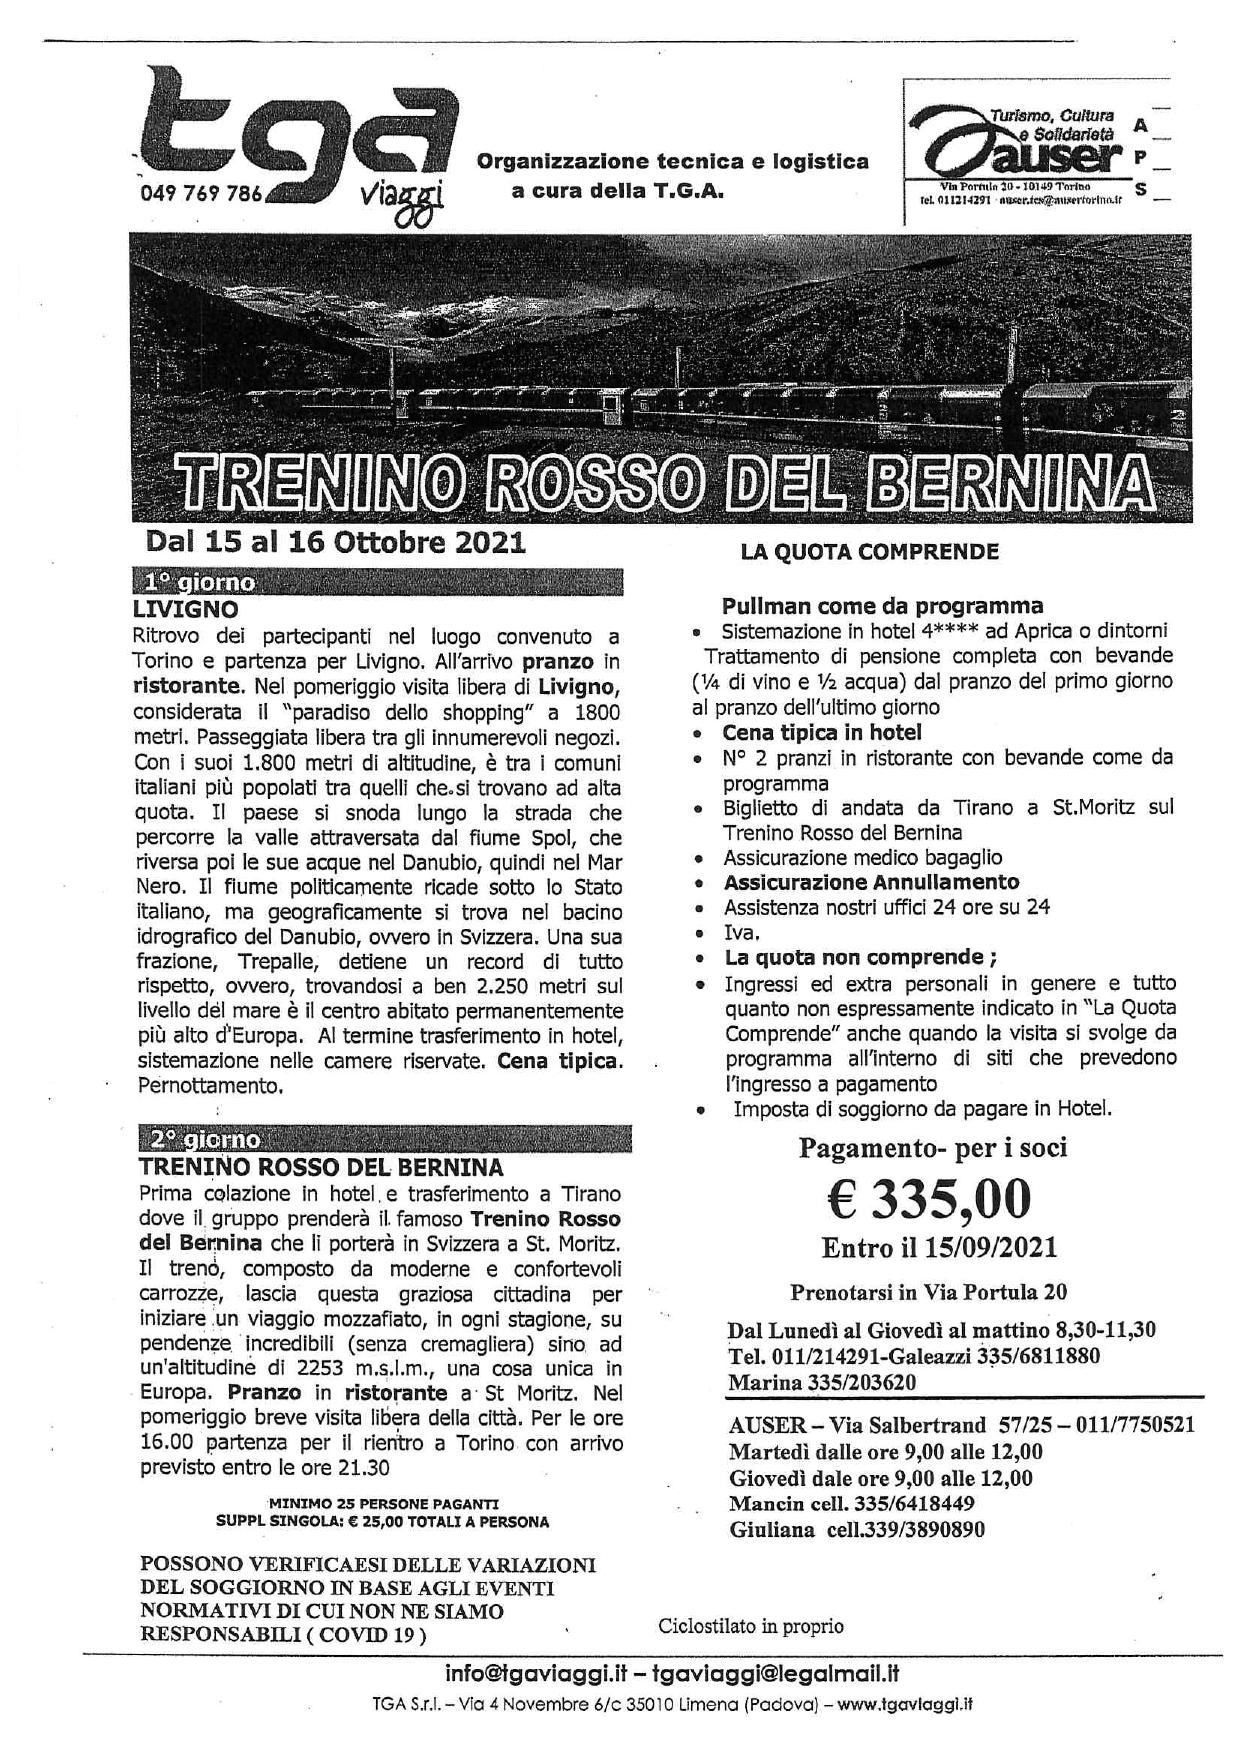 TRENINO DEL BERNINA (2)_page-0001